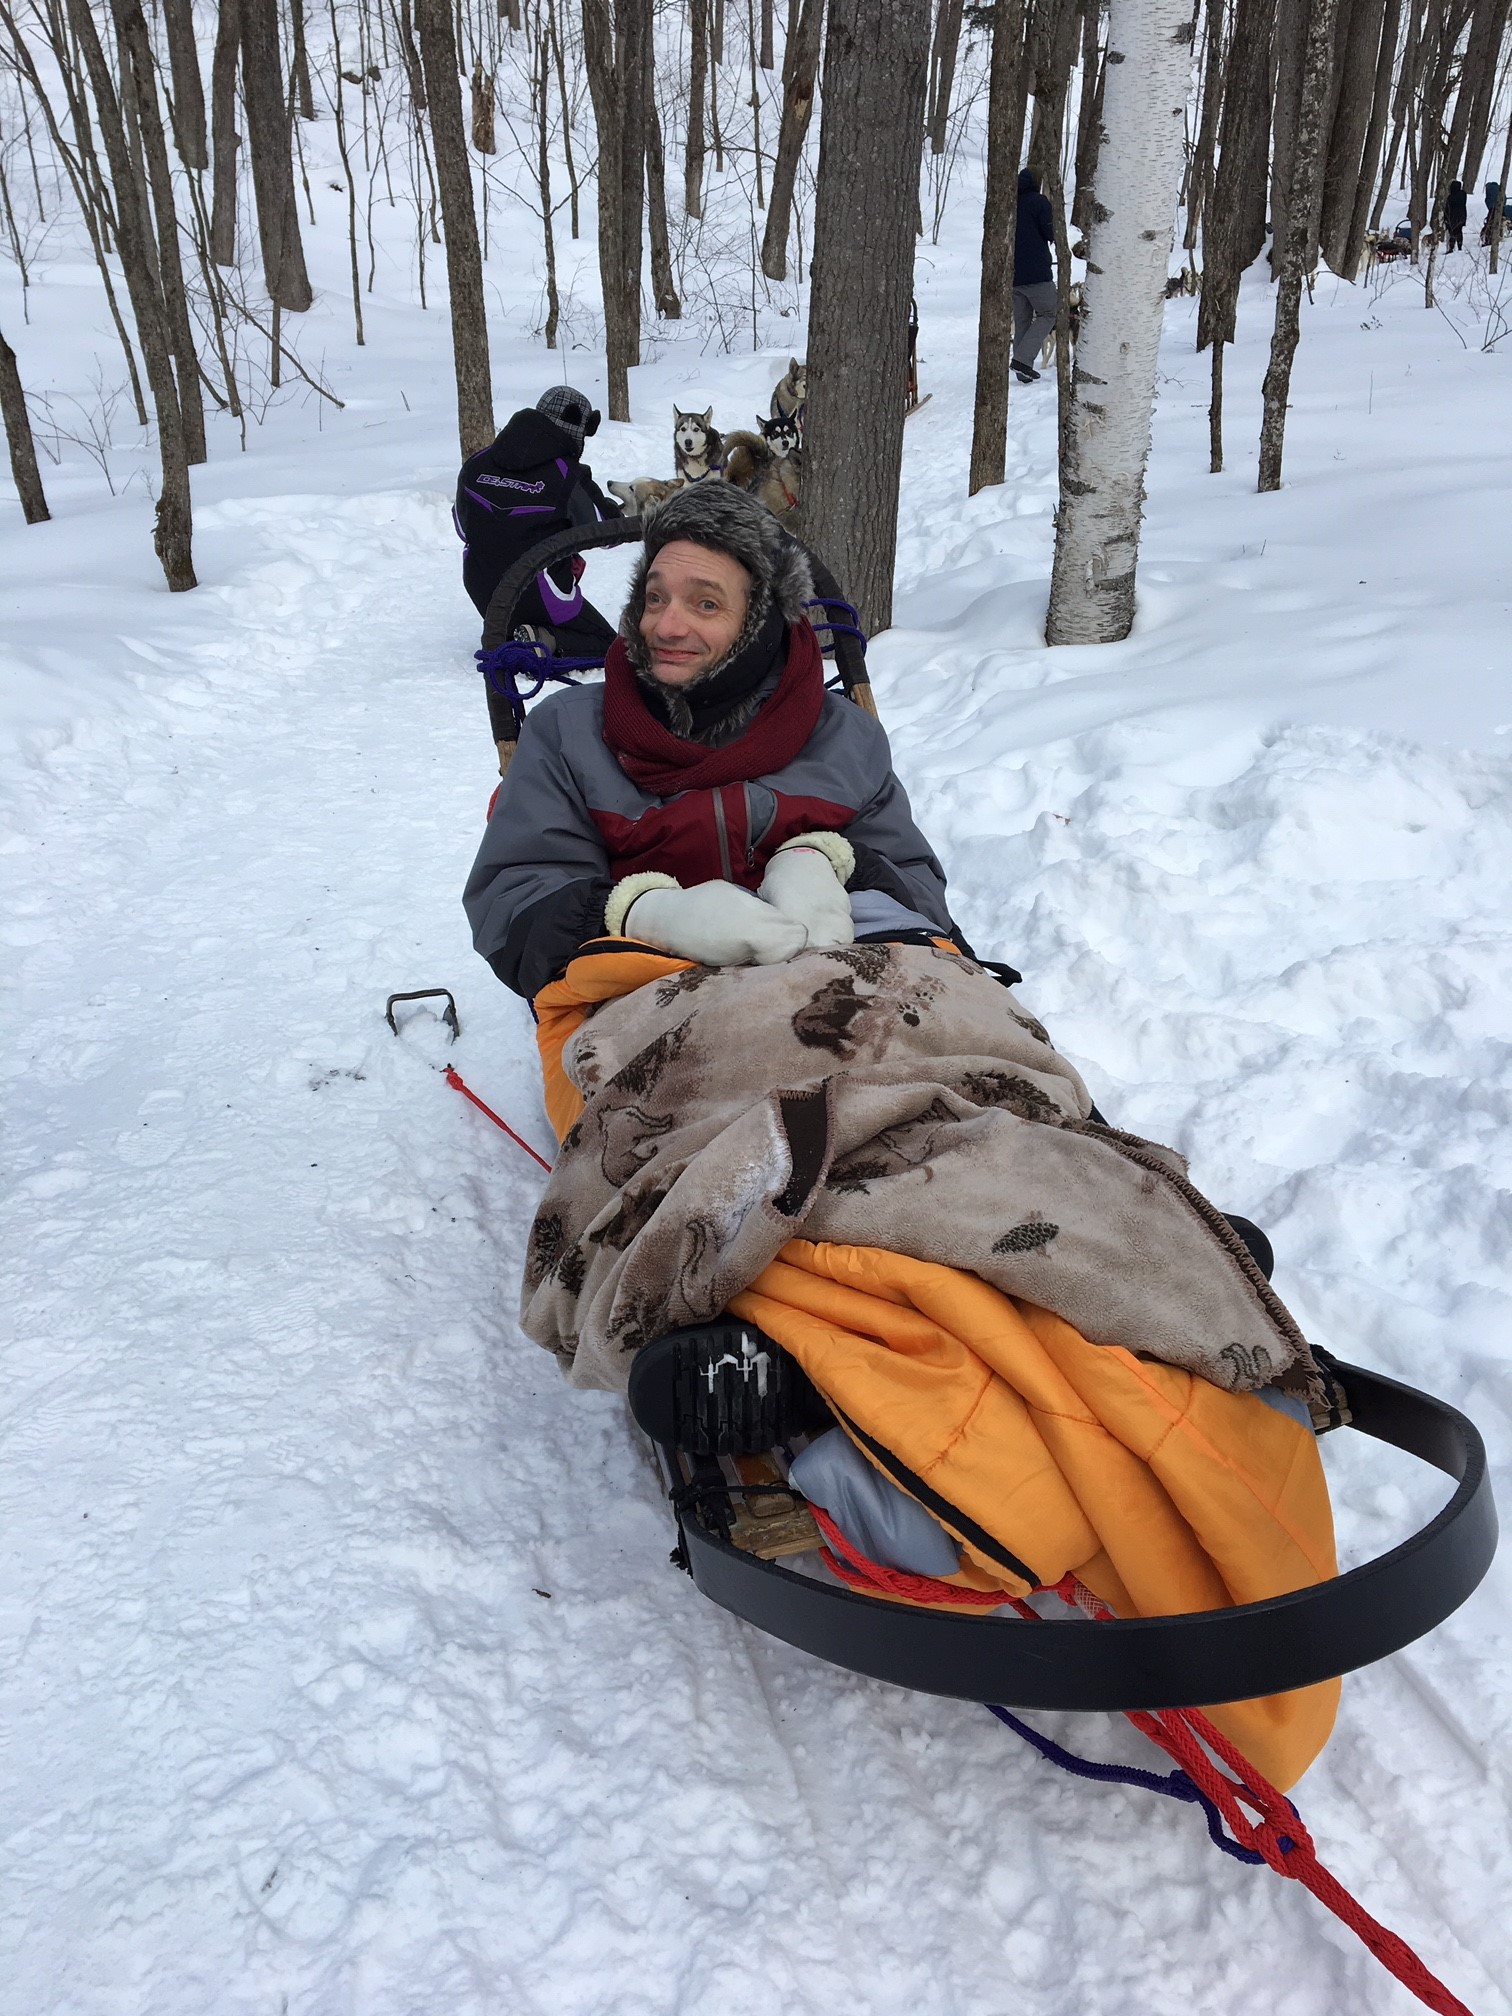 Doug and Mitch Dog sledding March 2019